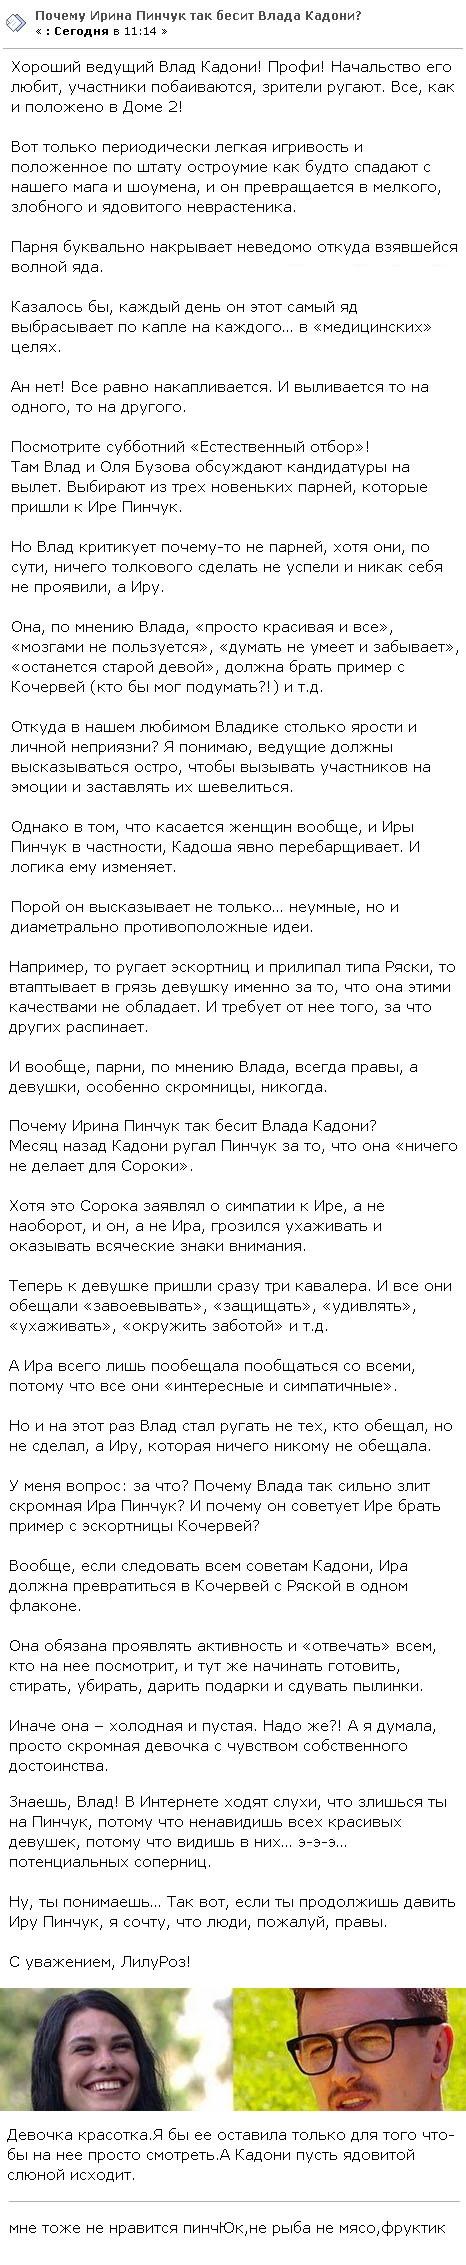 Почему Влад Кадони так люто ненавидит Ирину Пинчук